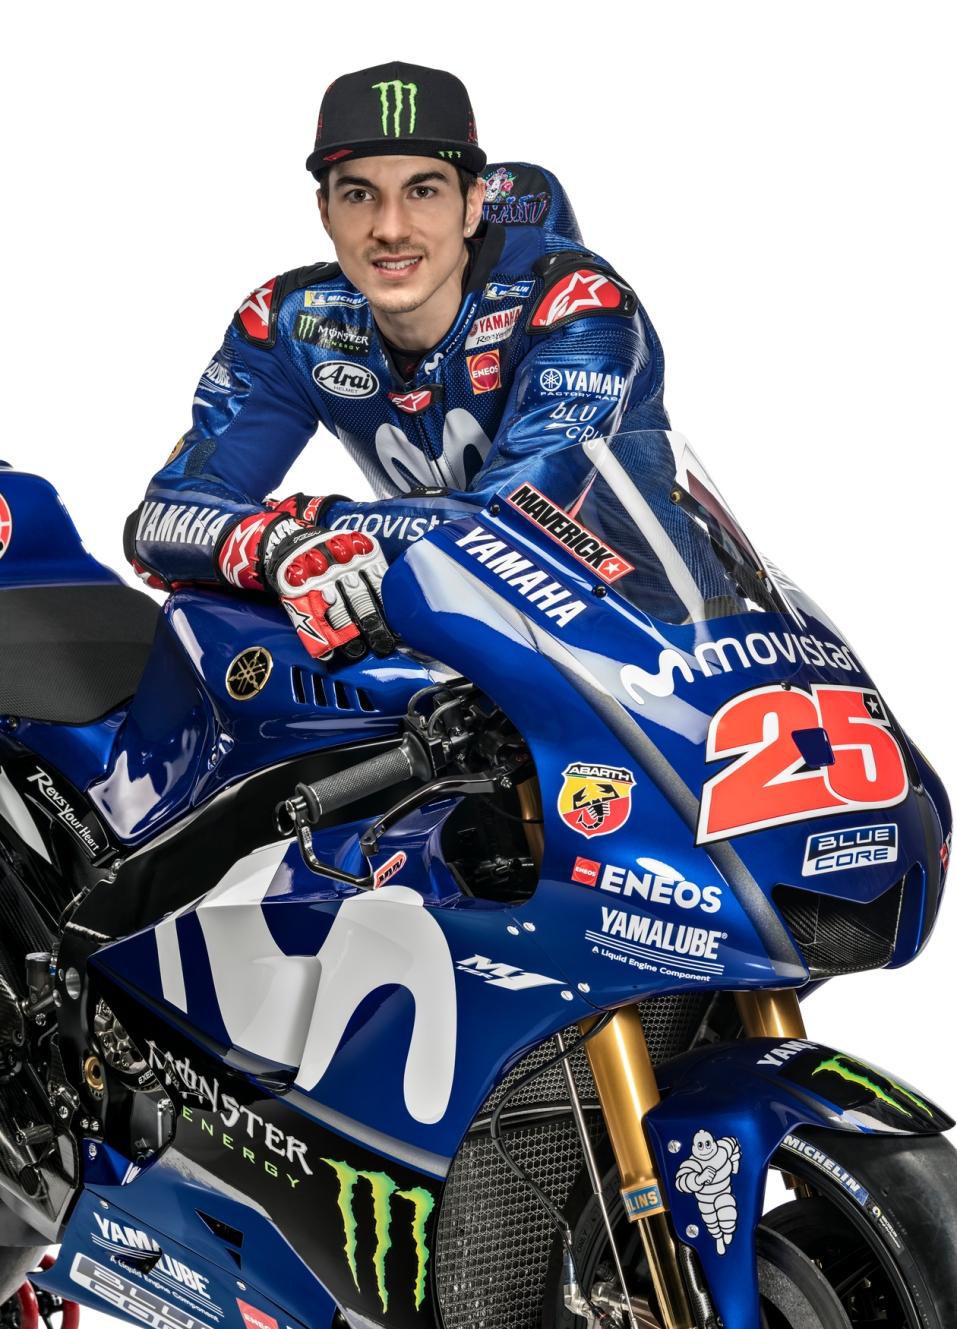 Maverick Vinales MotoGP 2018 (19)